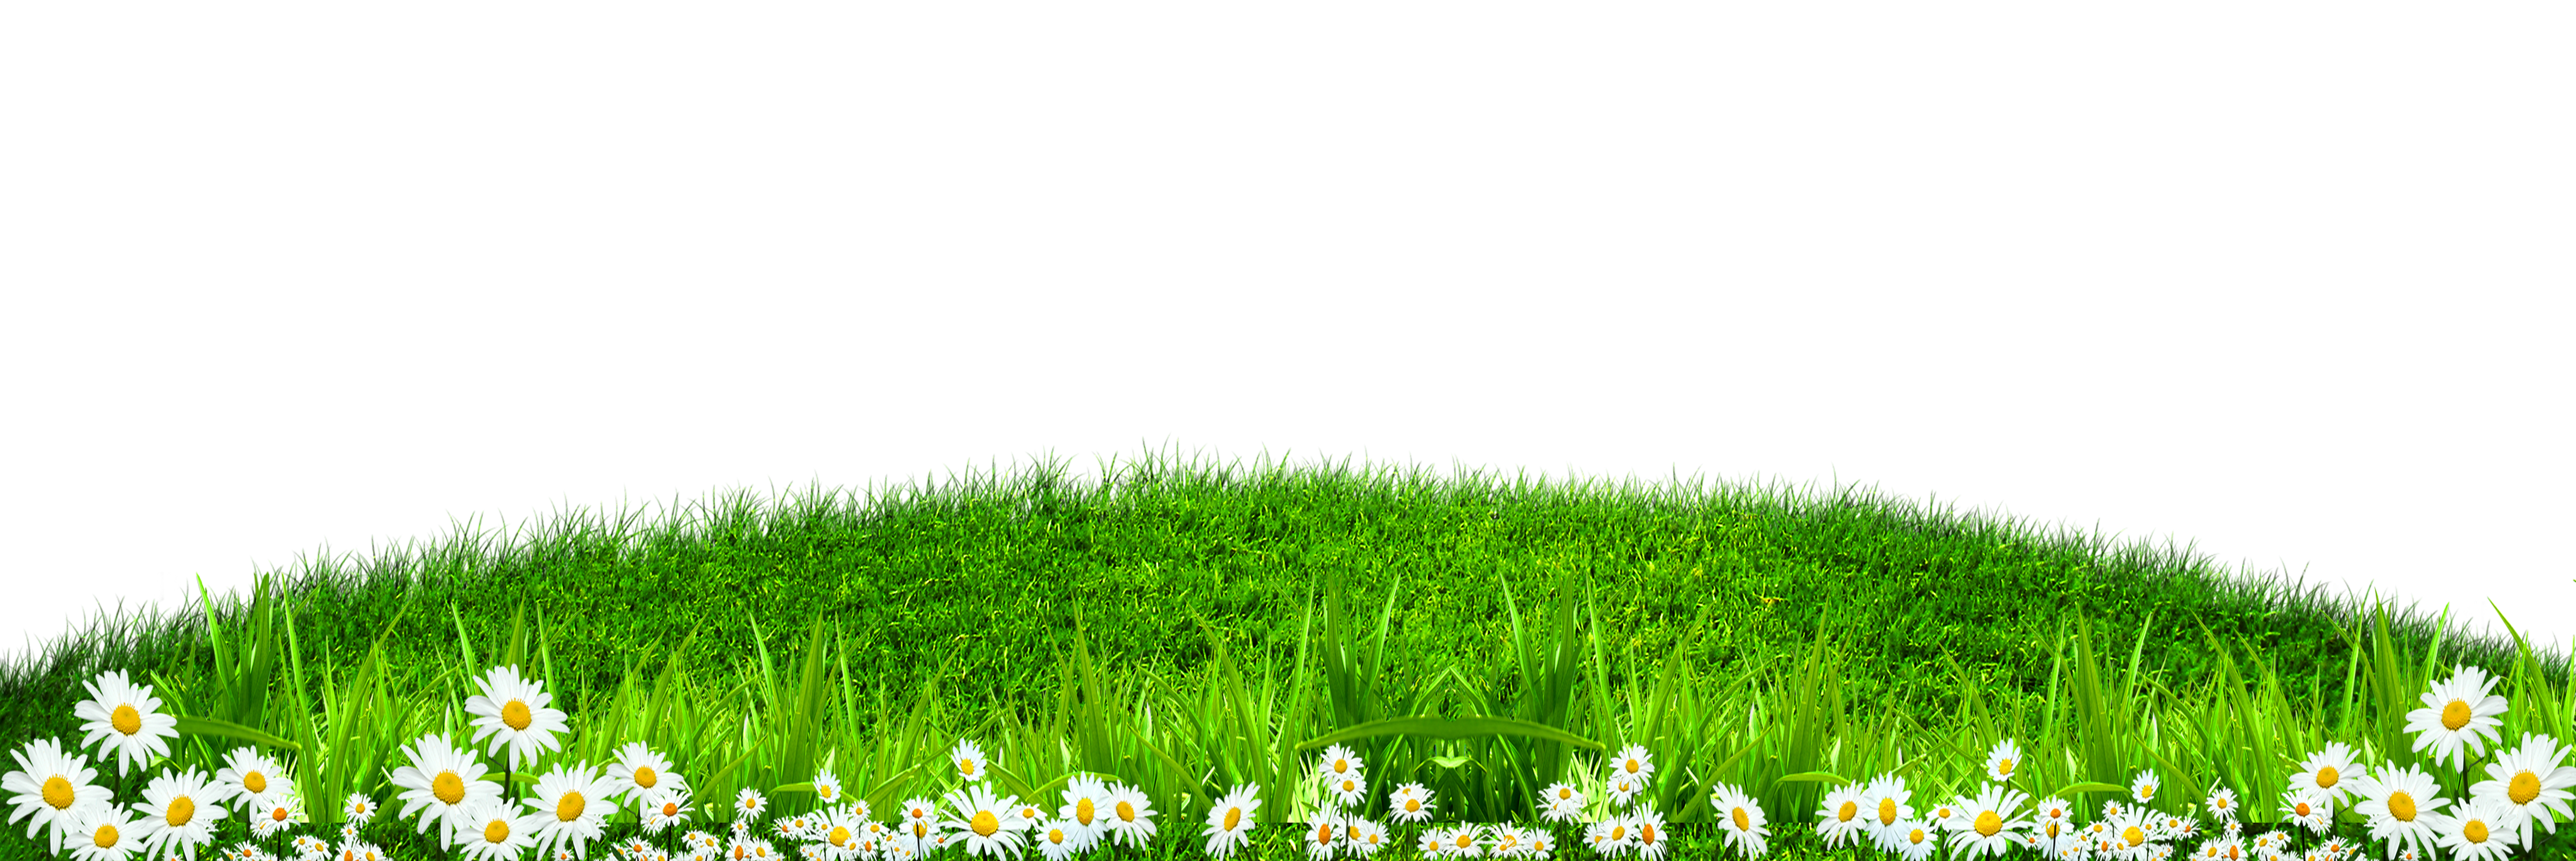 Grass border png. Wallpaper green white texture